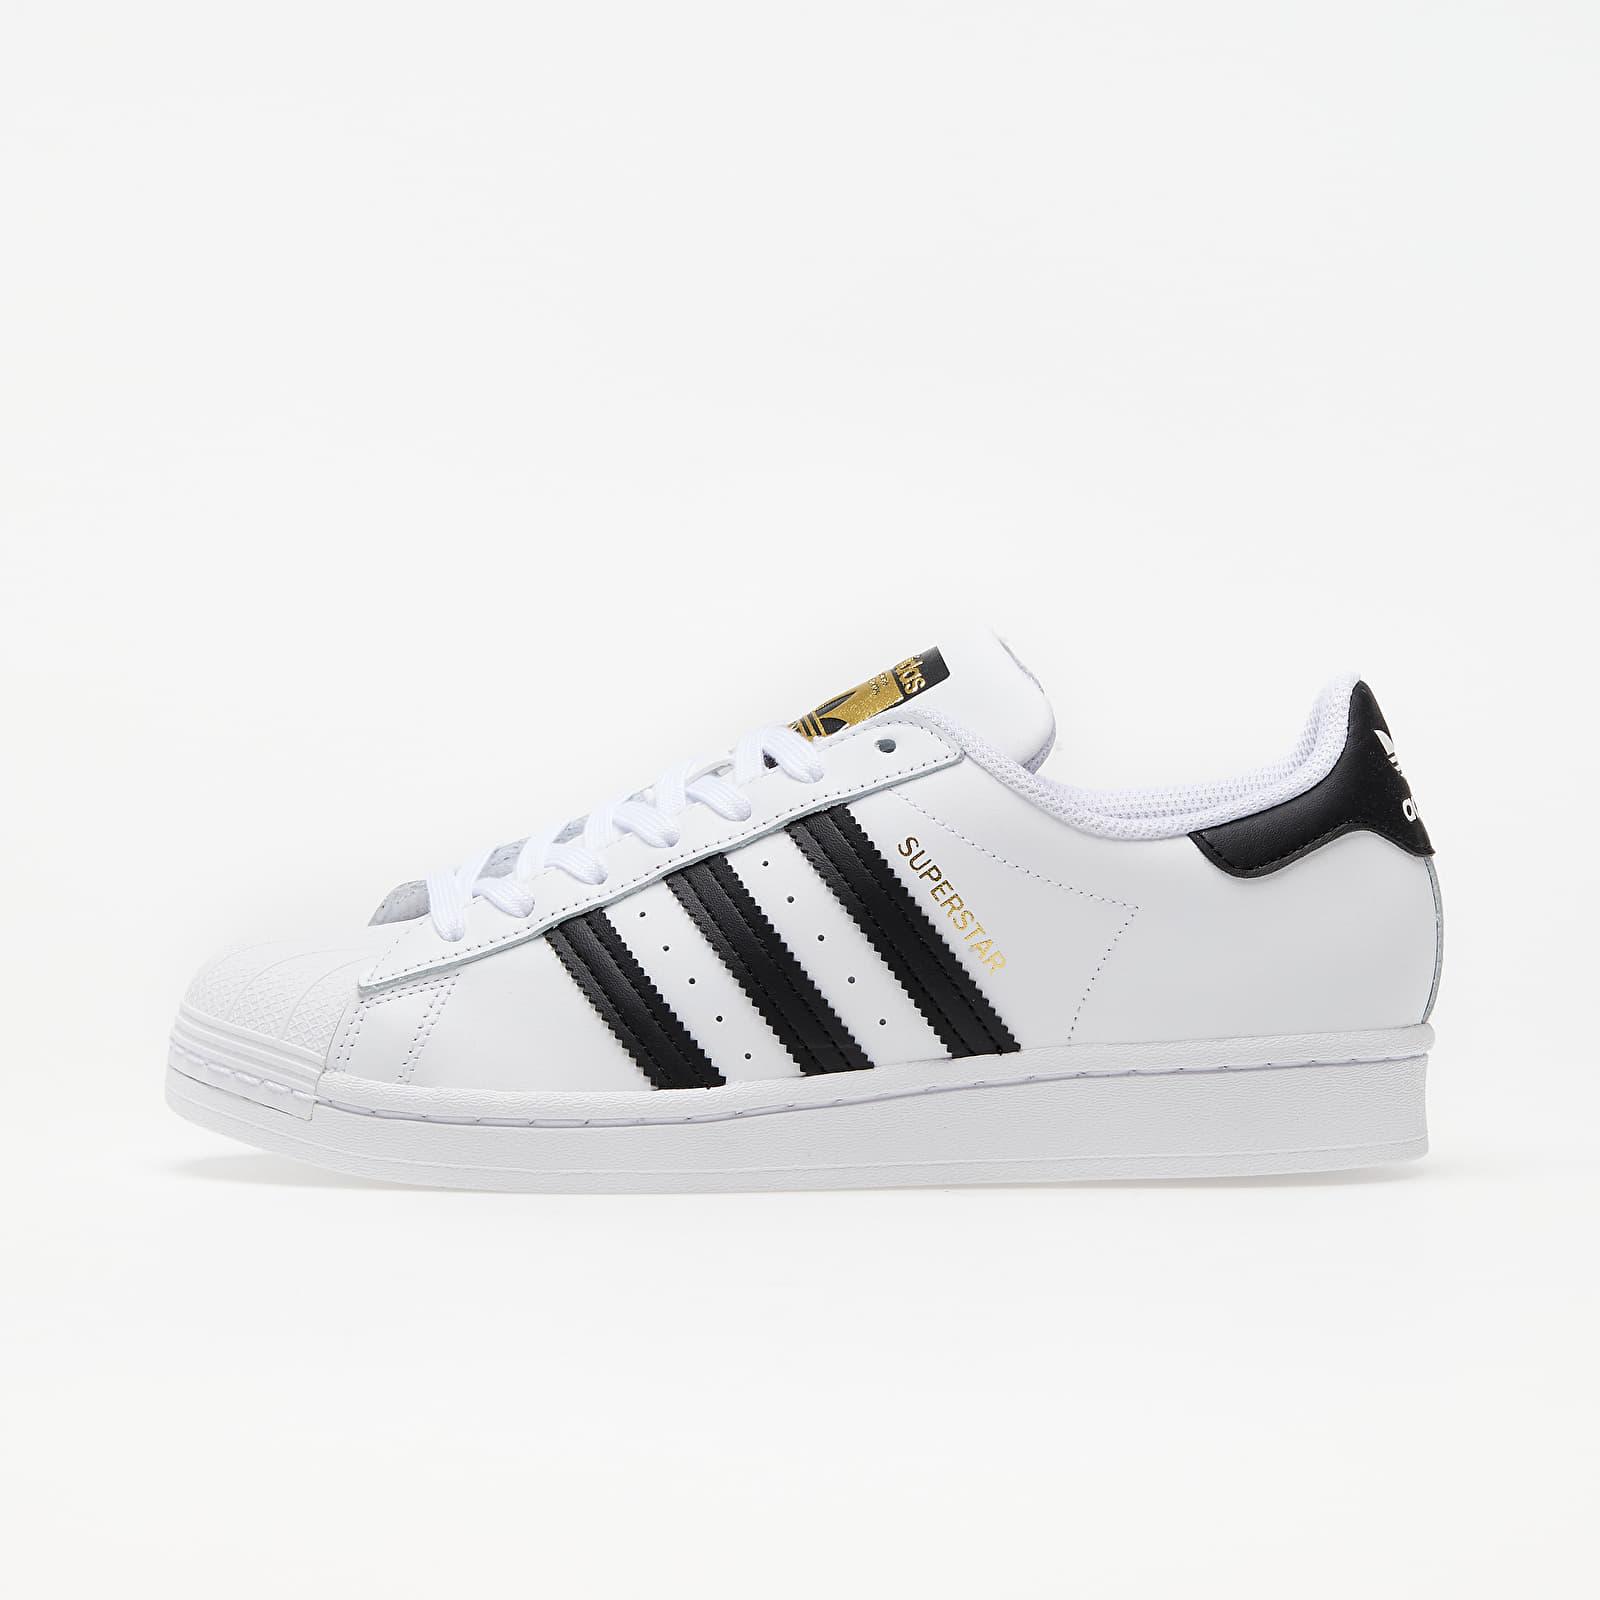 Men's shoes adidas Superstar Ftw White/ Core Black/ Ftw White